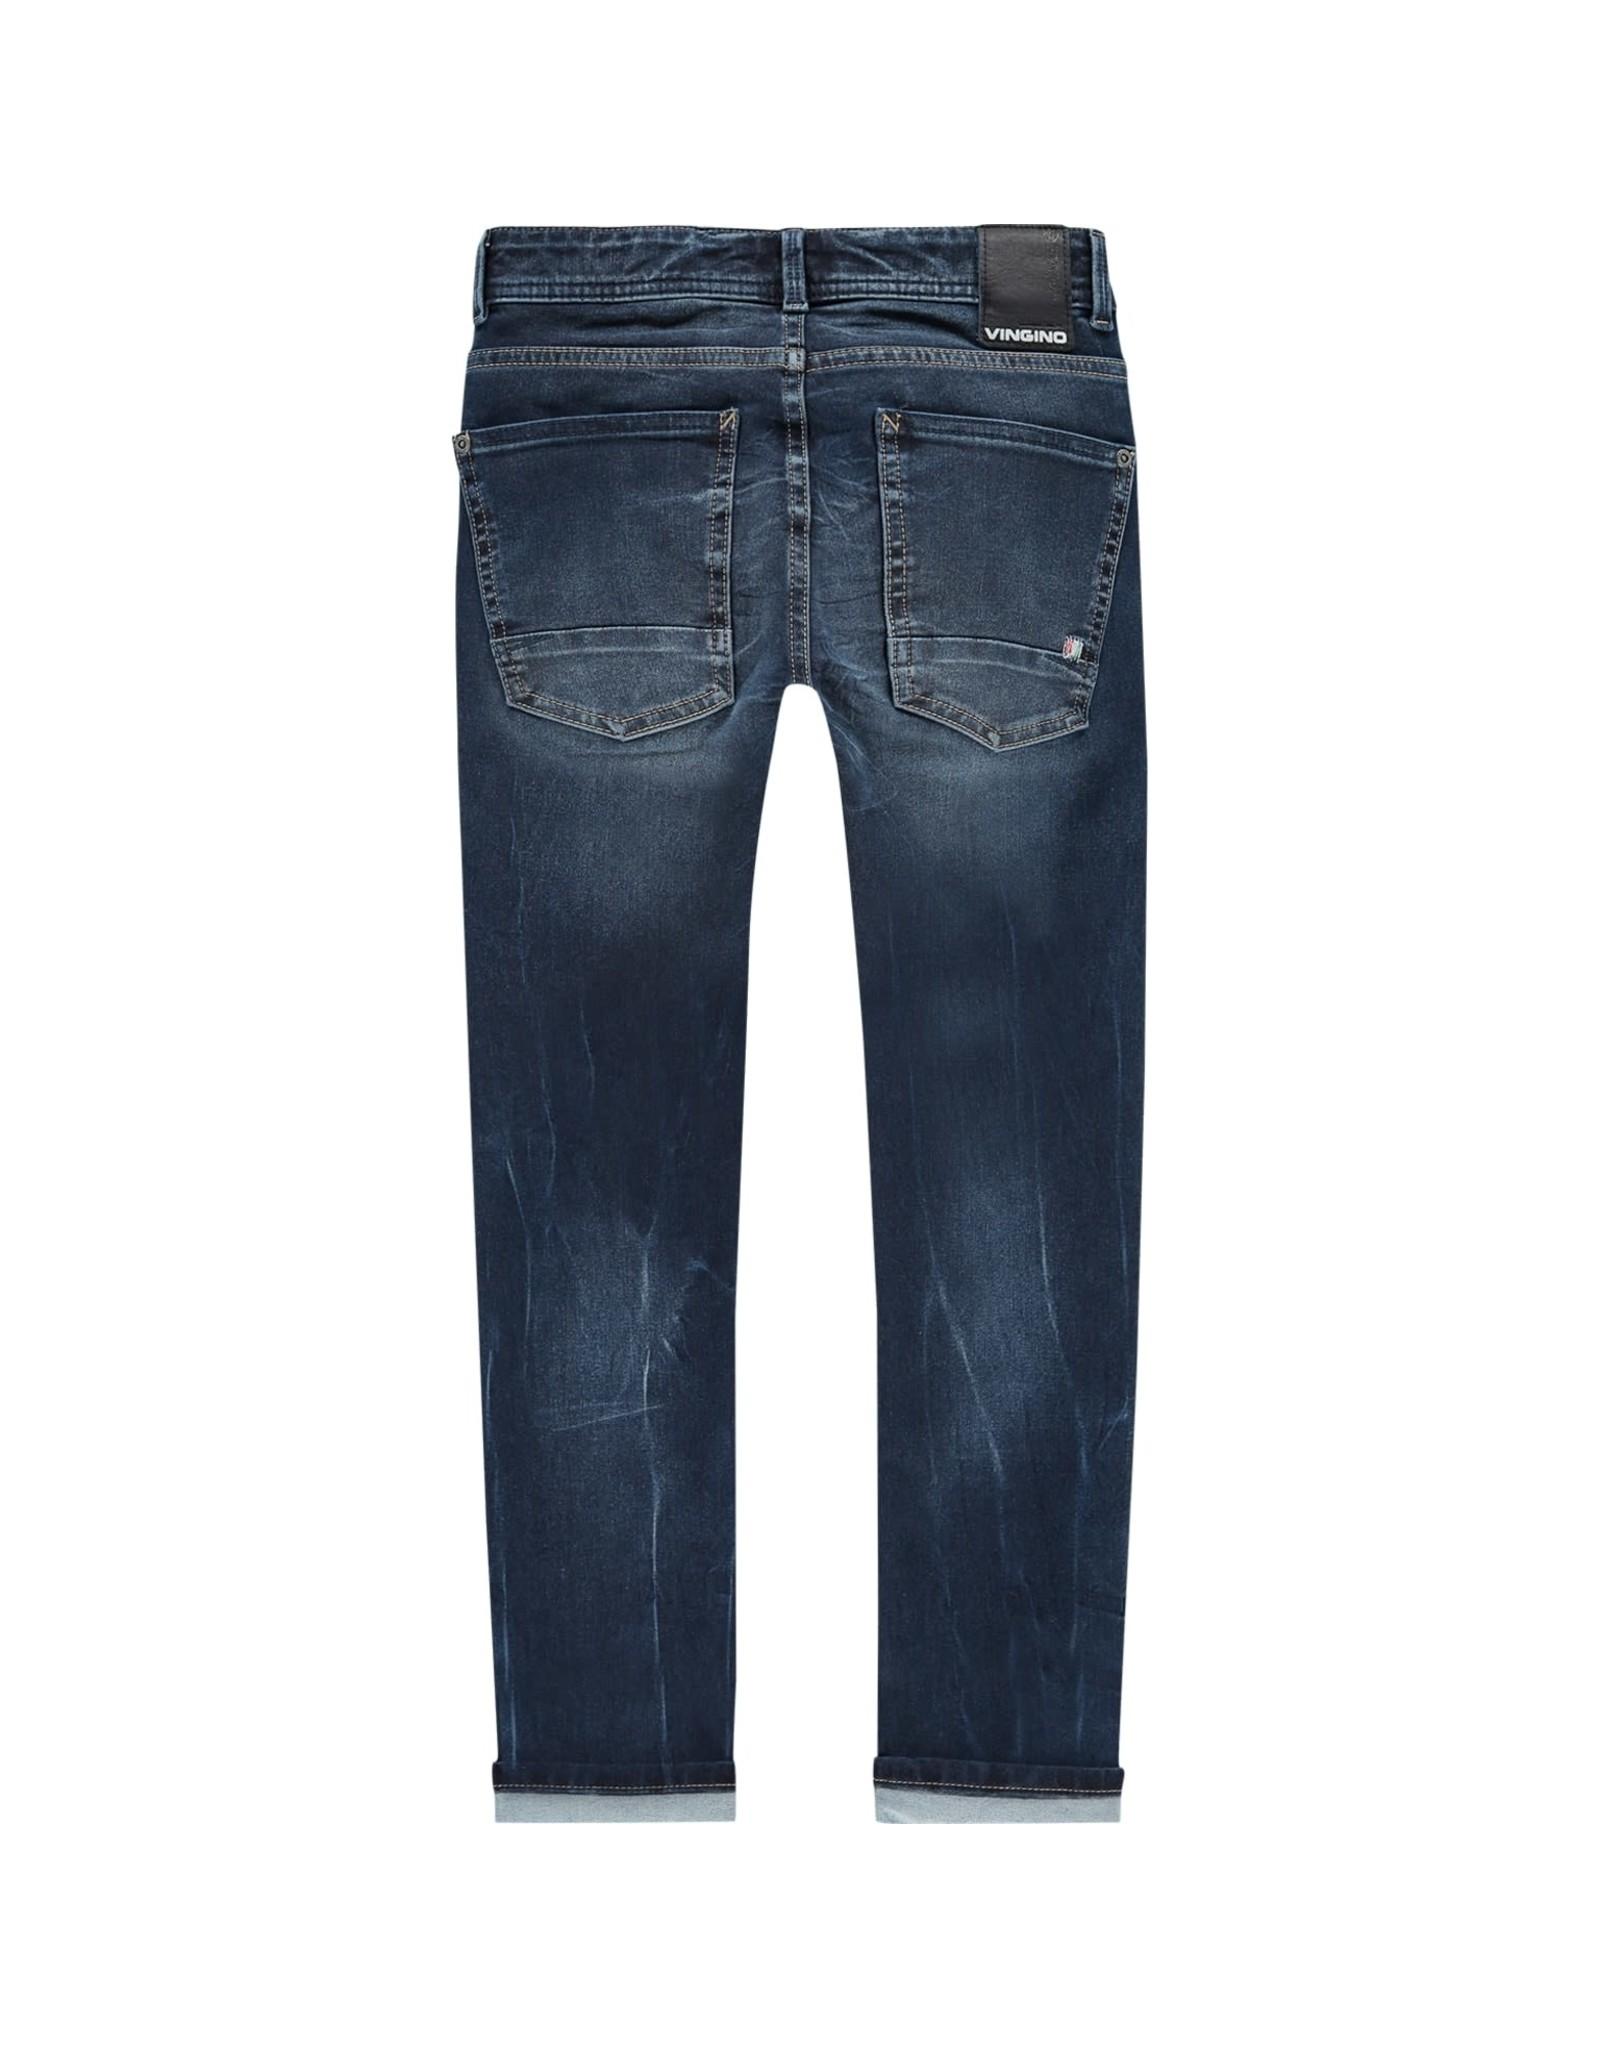 Vingino Vingino jongens 4-way strech jeans Alfons Blue Vintage